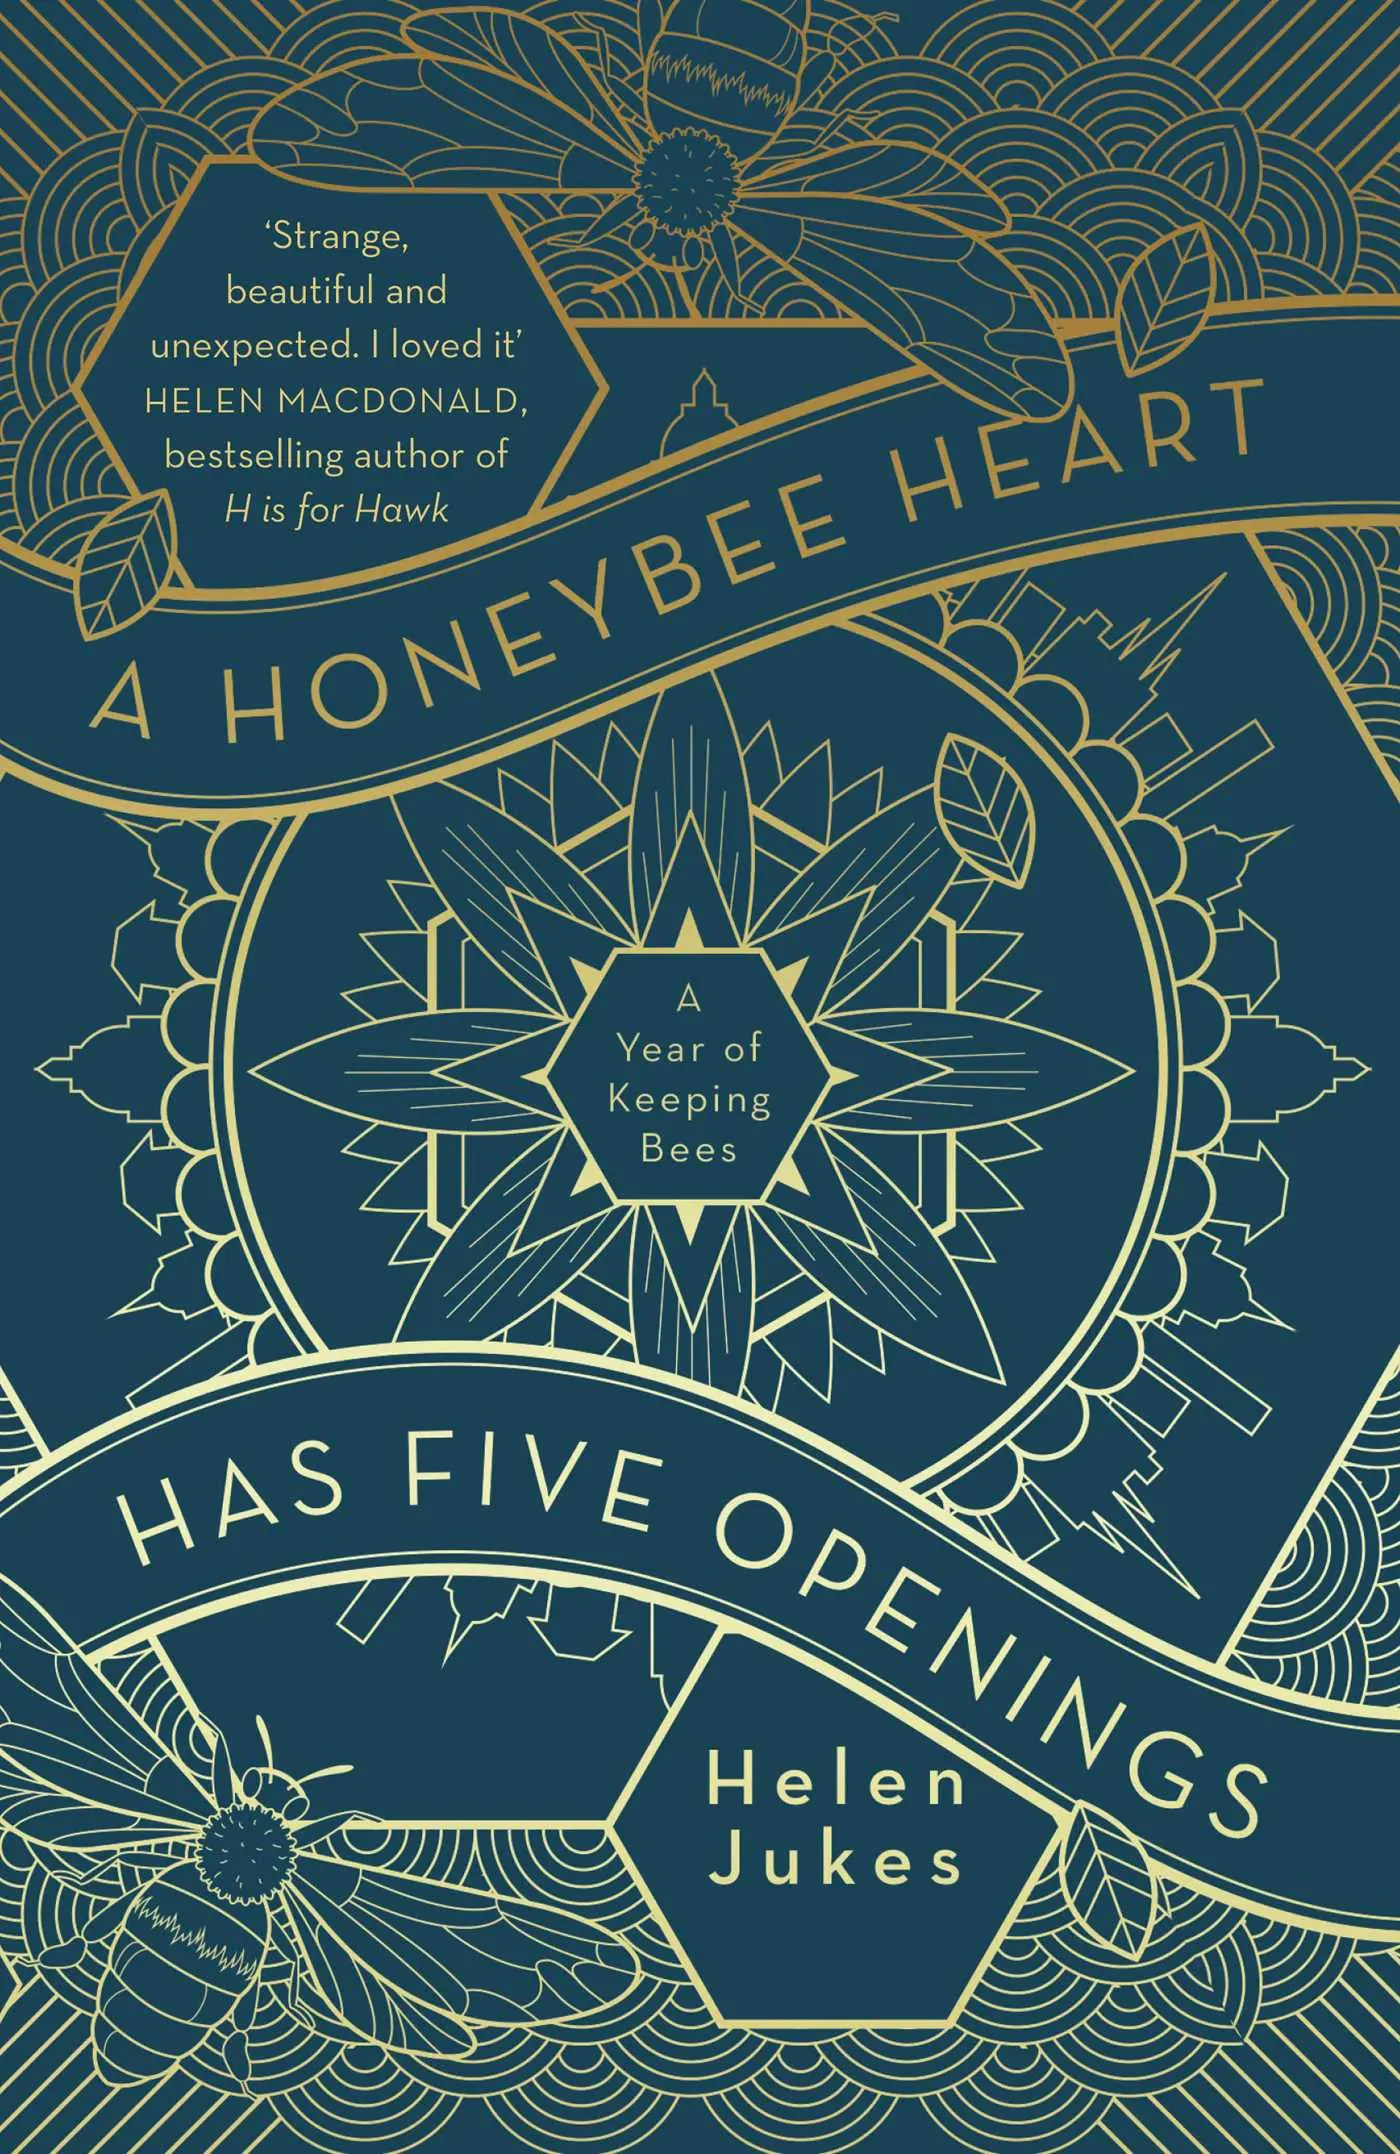 a honeybee heart has five openings 9781471167713 hr